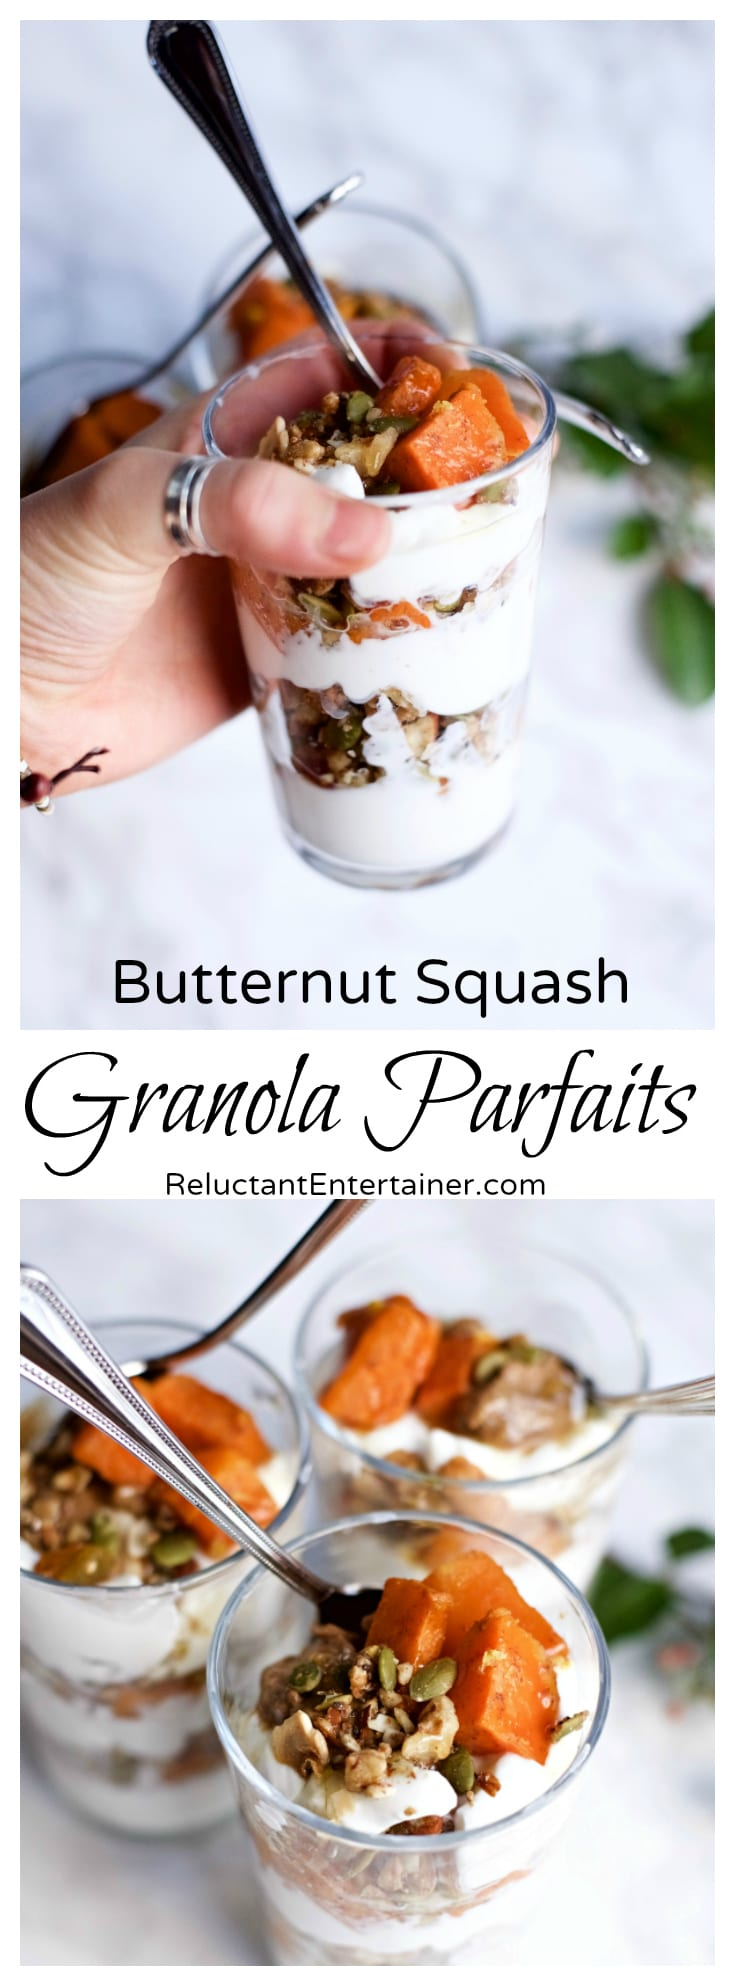 Butternut Squash Granola Parfaits